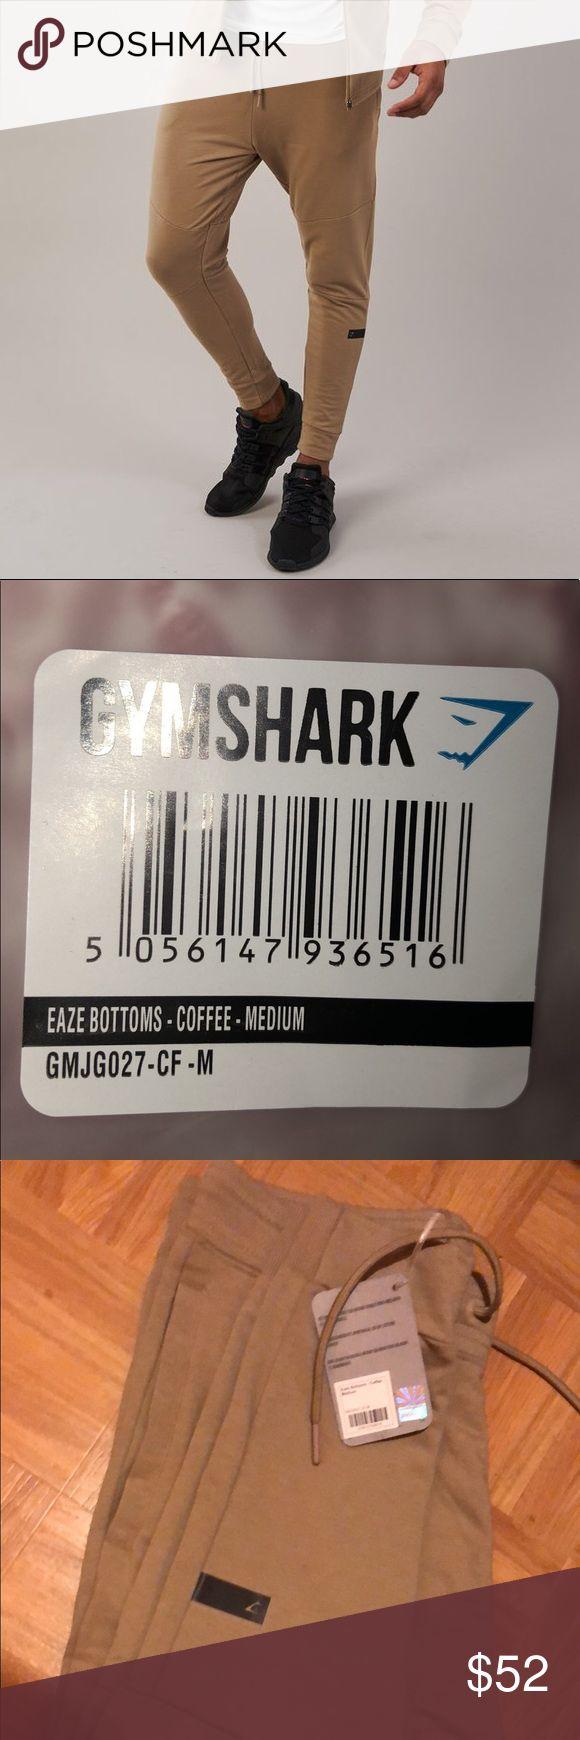 Gymshark Eaze Bottoms Coffee color Eaze Bottoms from Gymshark Size Medium Brand New - Have tags  Tags: Gymshark, Alphalete Pants Sweatpants & Joggers